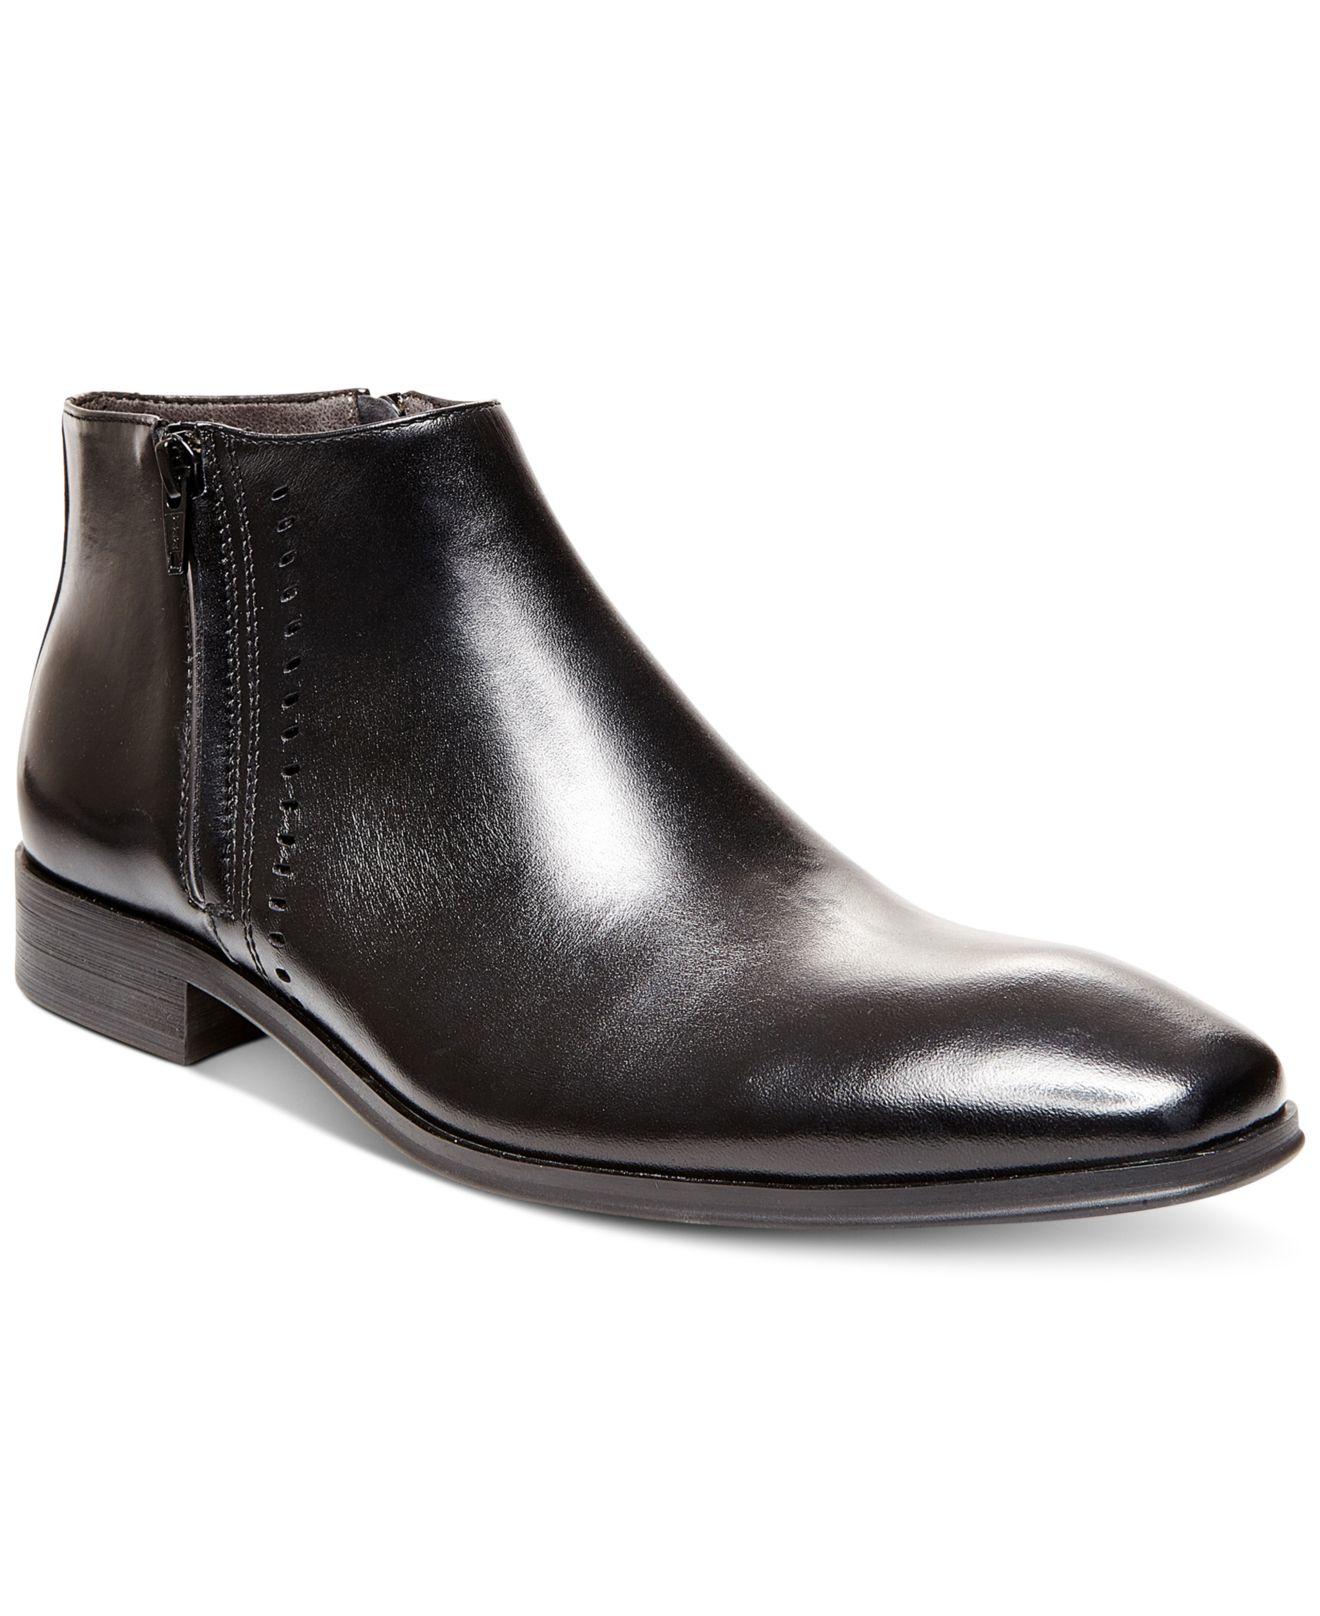 ba67eb1a018 Steve Madden Black Felcore Dress Boots for men